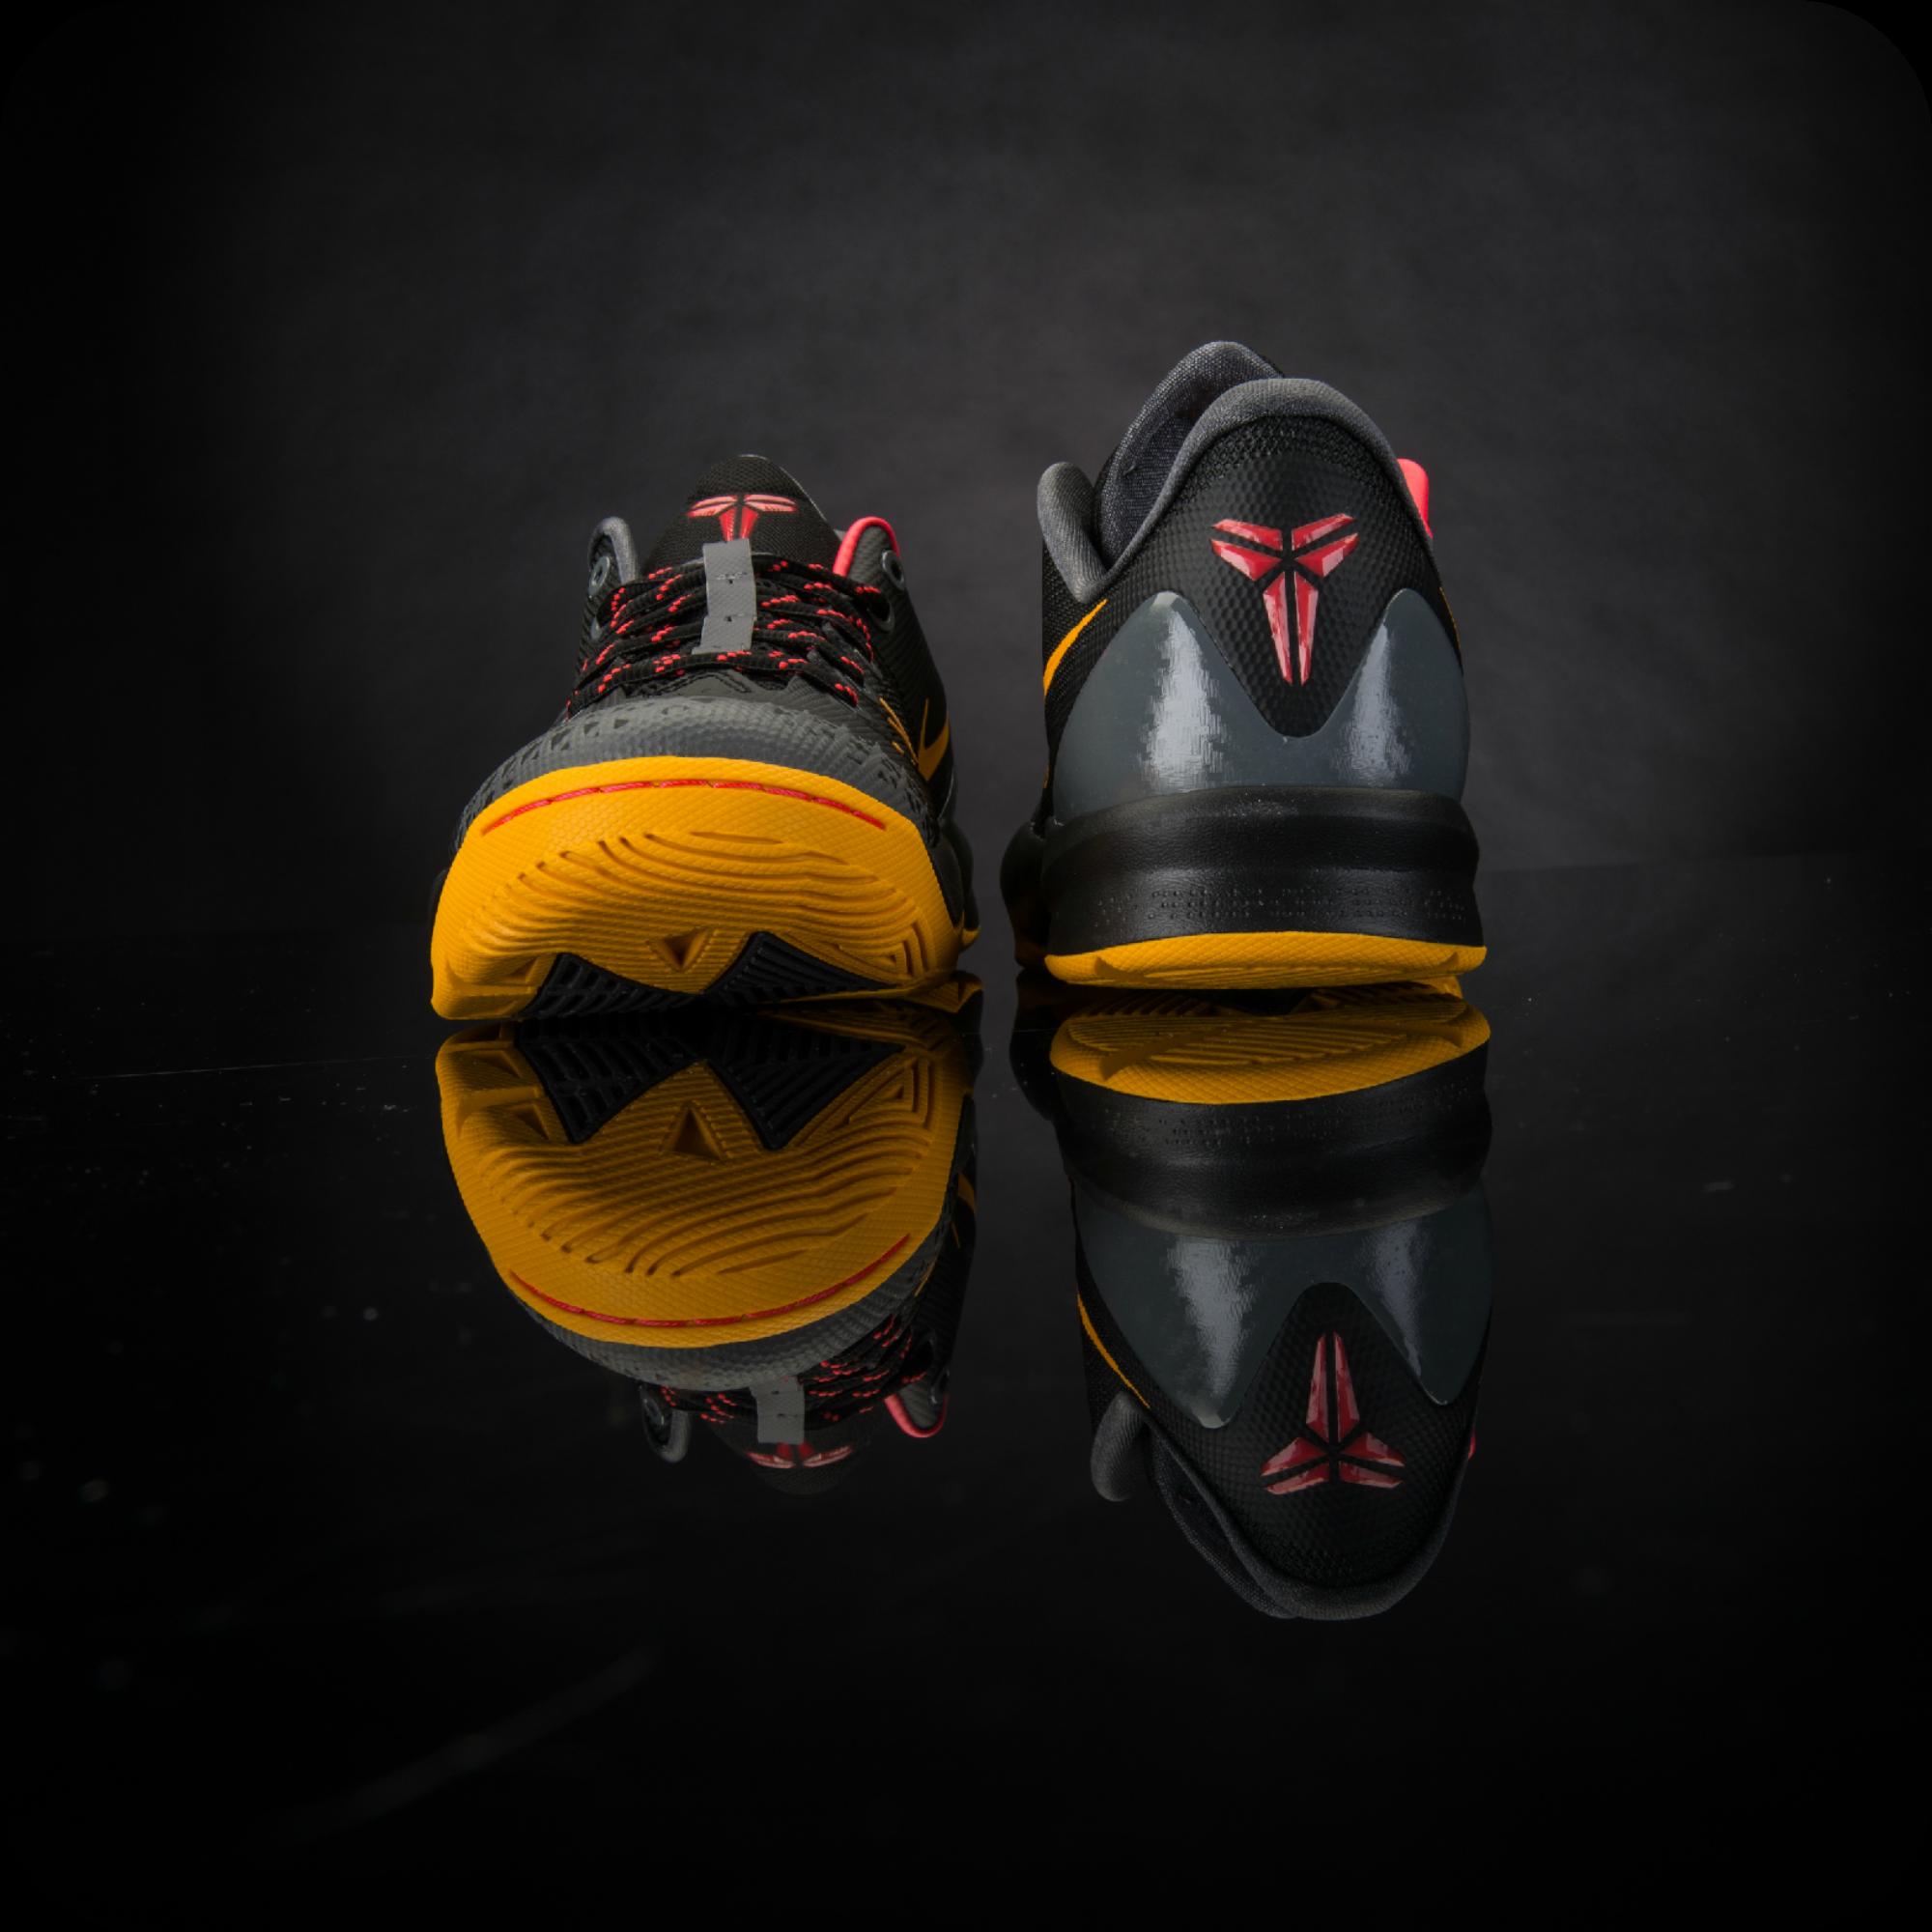 new styles bc302 3c53c 535807 103 CP3 Shoes 2013 White Black Game Royal Sport Red Jordan CP3.VI    ♡♡SHOE SNOB♡♡   Pinterest   Shoes, Jordans and Nike